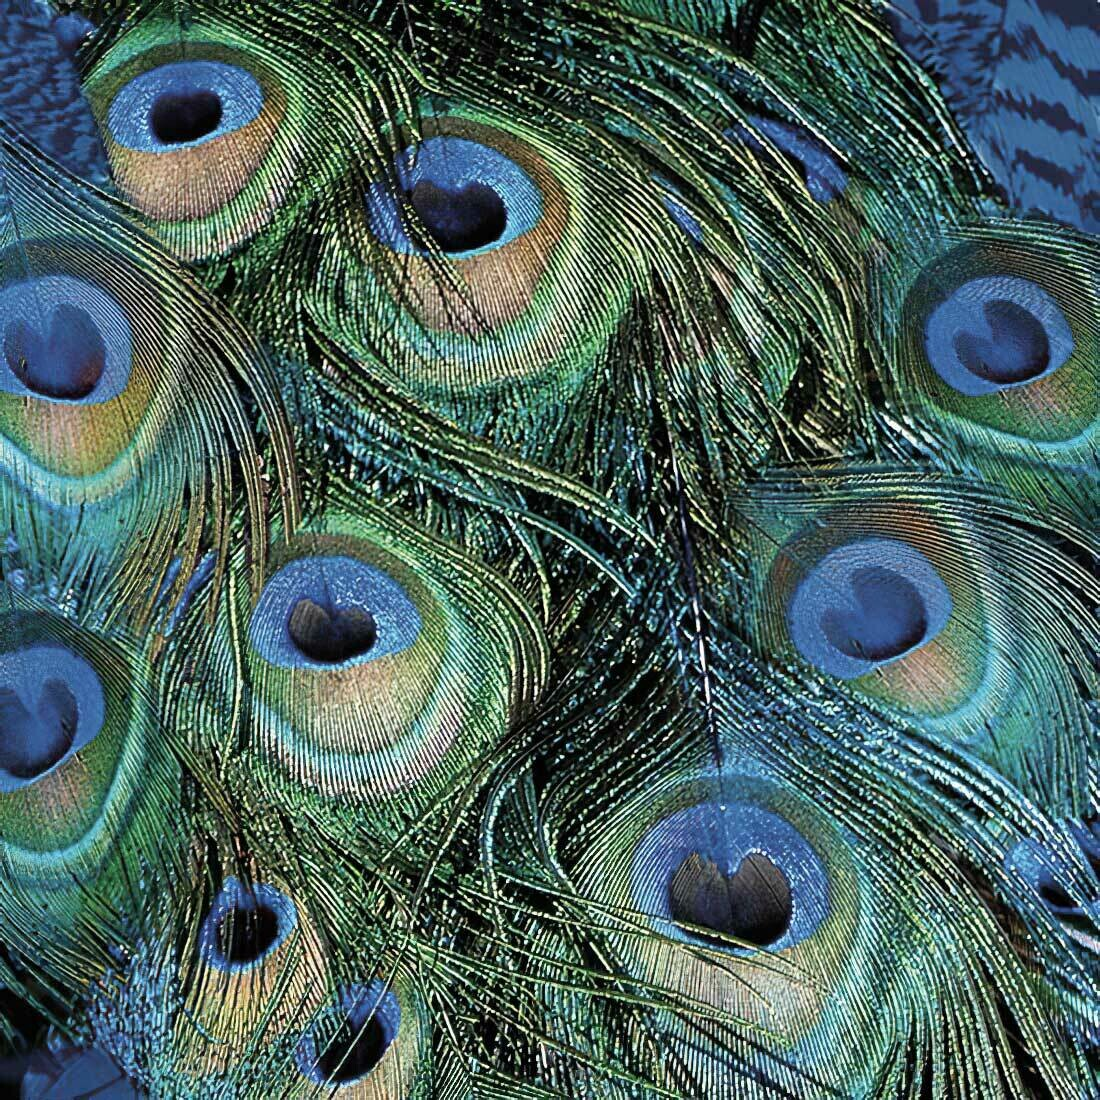 Decoupage Paper Napkins - Bird - Peacock-Feathers (1 Sheet)